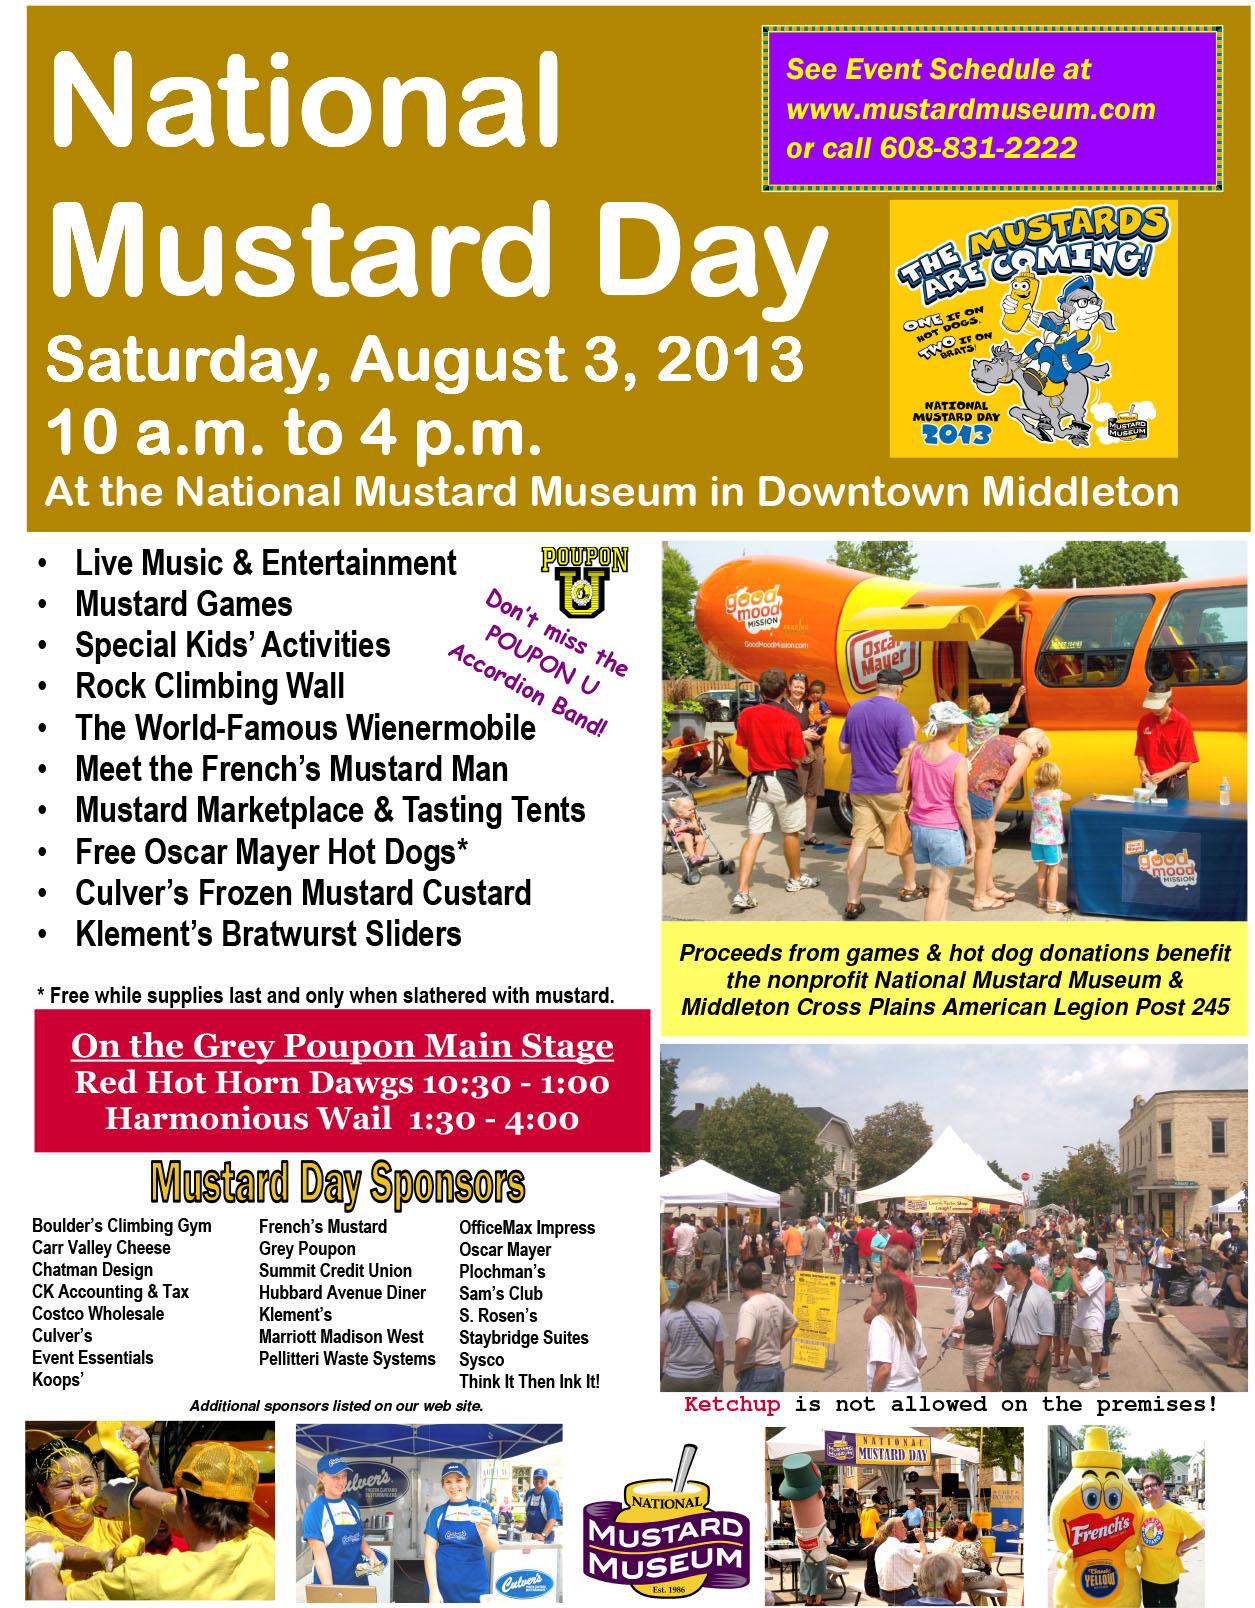 2013 National Mustard Day | National Mustard Museum